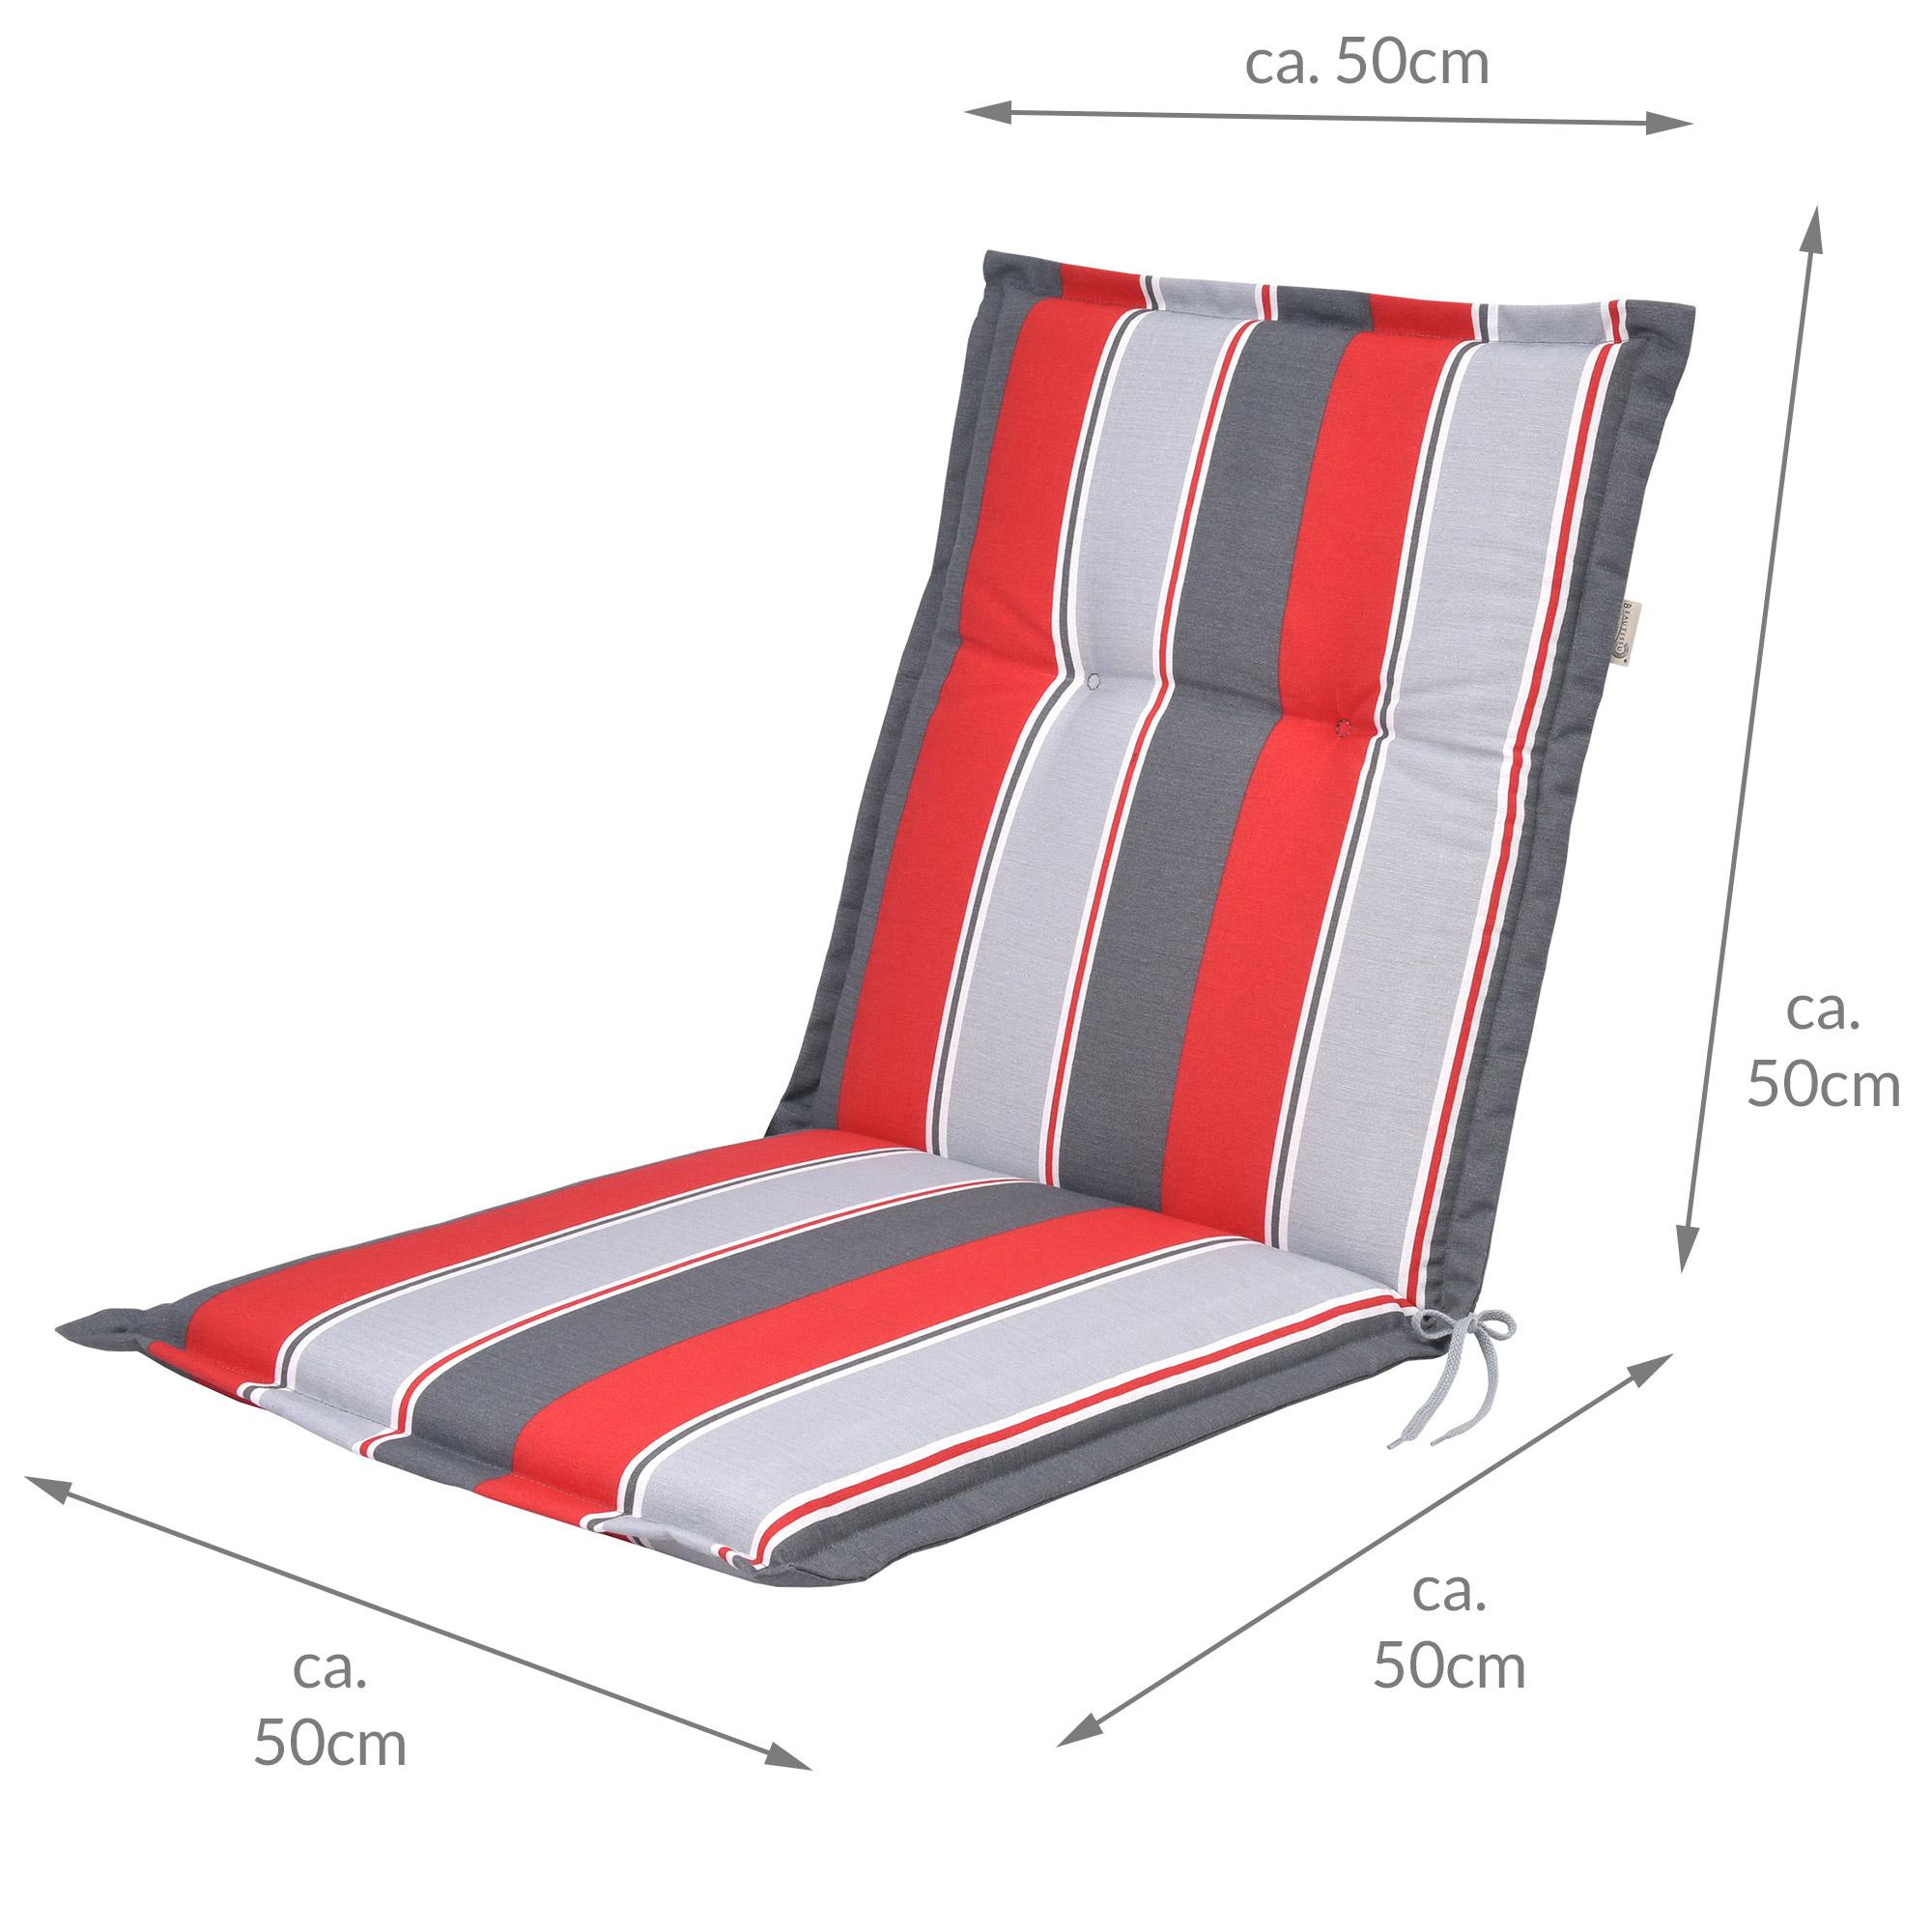 auflagen niedriglehner niederlehner kissen stuhlauflagen stapelstuhl gartenstuhl ebay. Black Bedroom Furniture Sets. Home Design Ideas